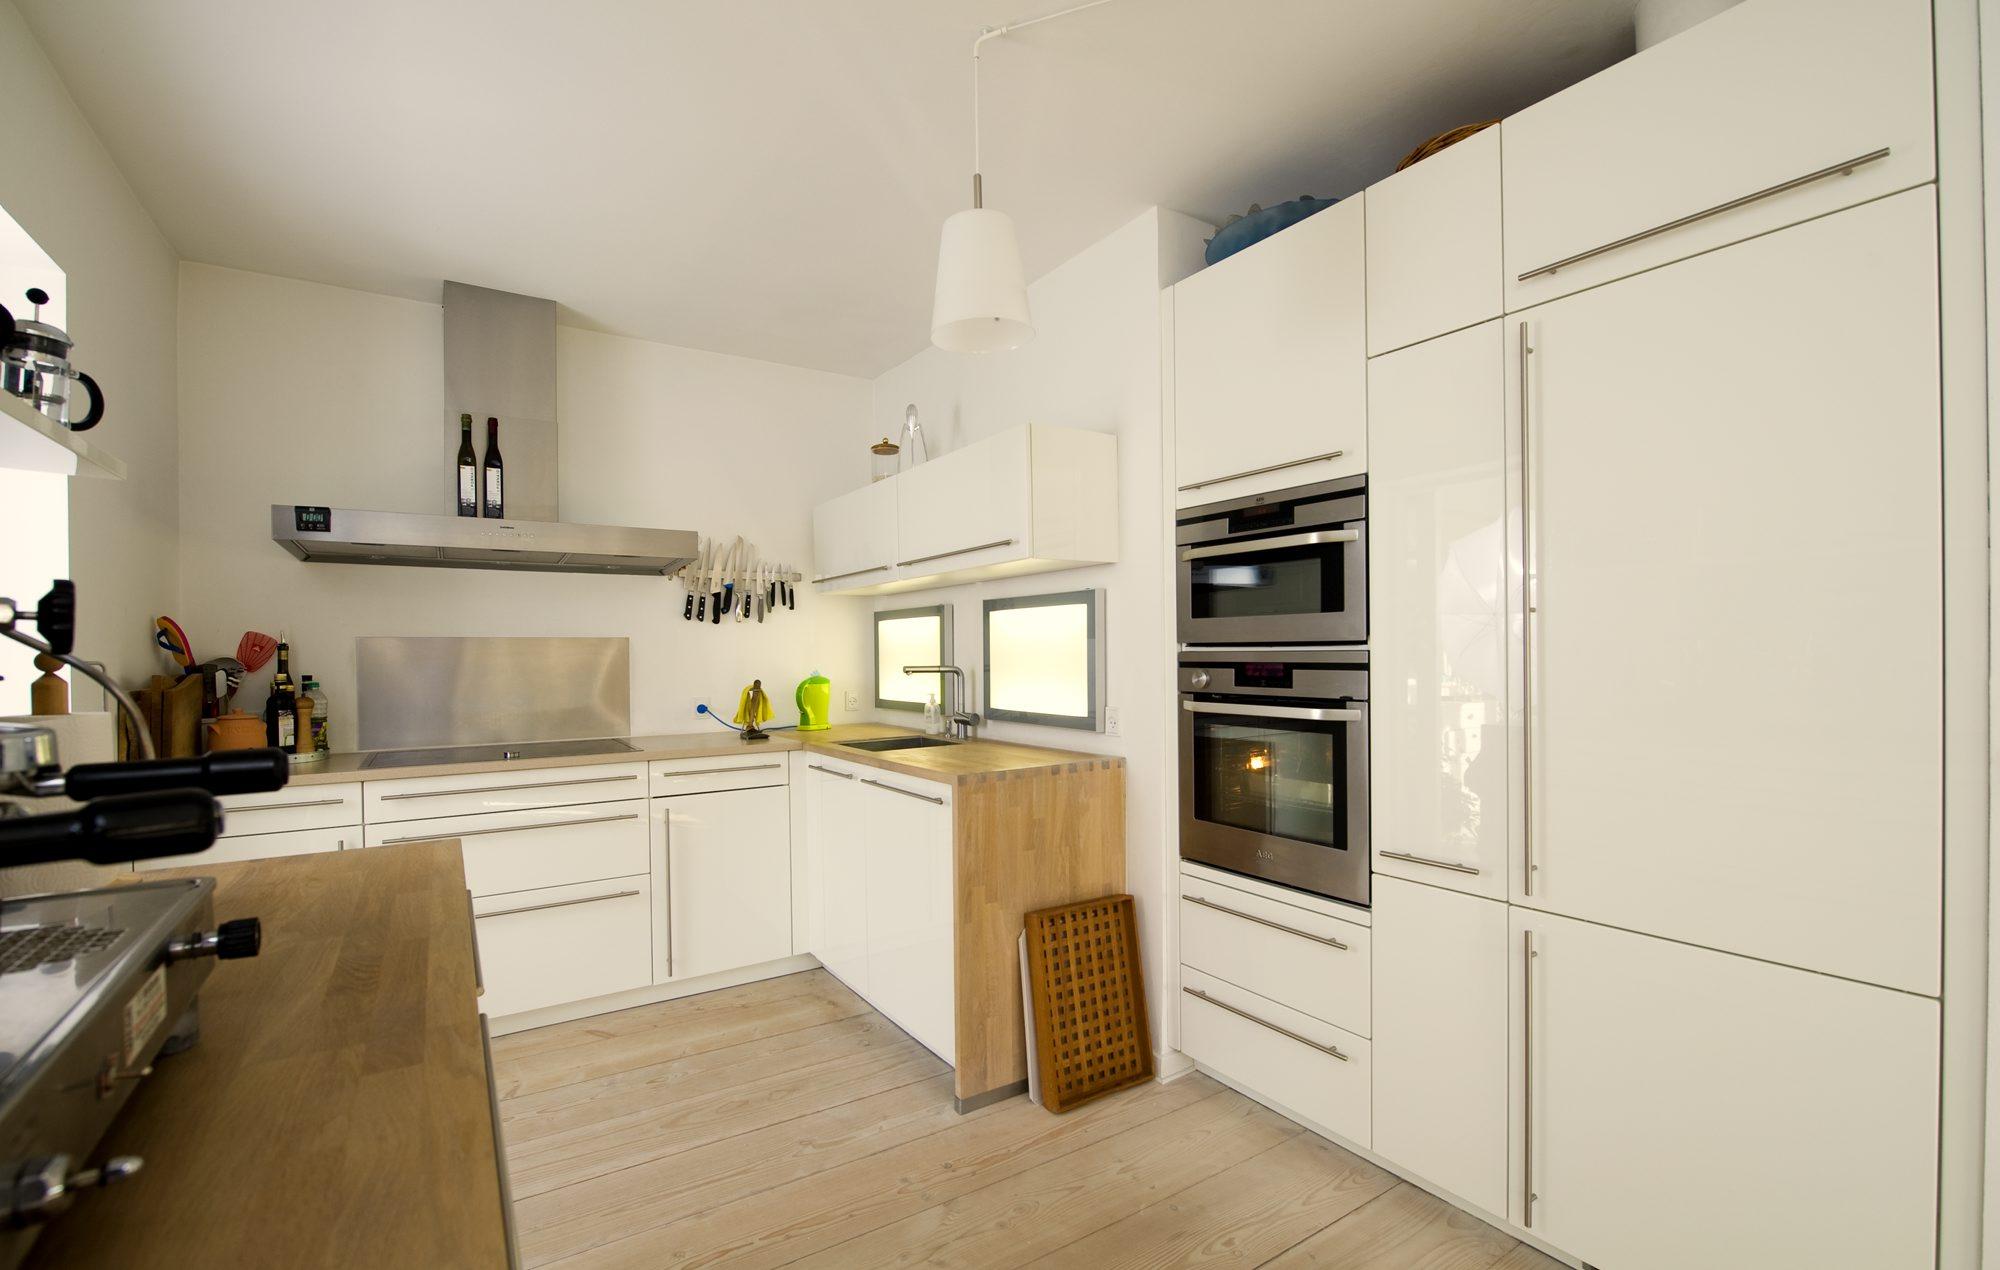 Fra 6 til 55 kvadratmeter nyt køkken